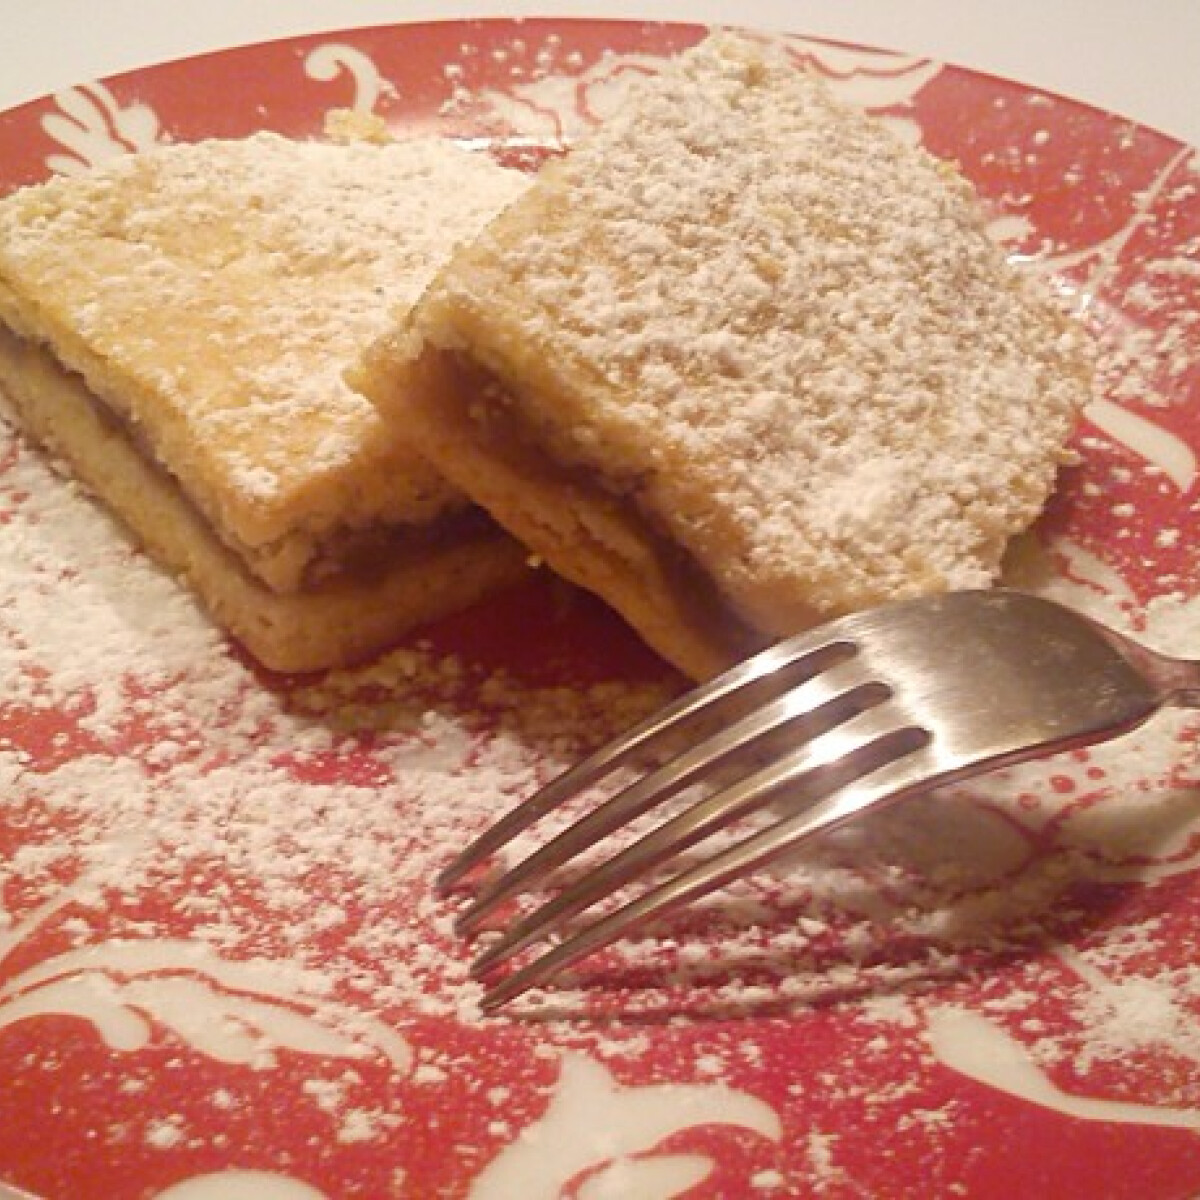 Legfinomabb almás pite